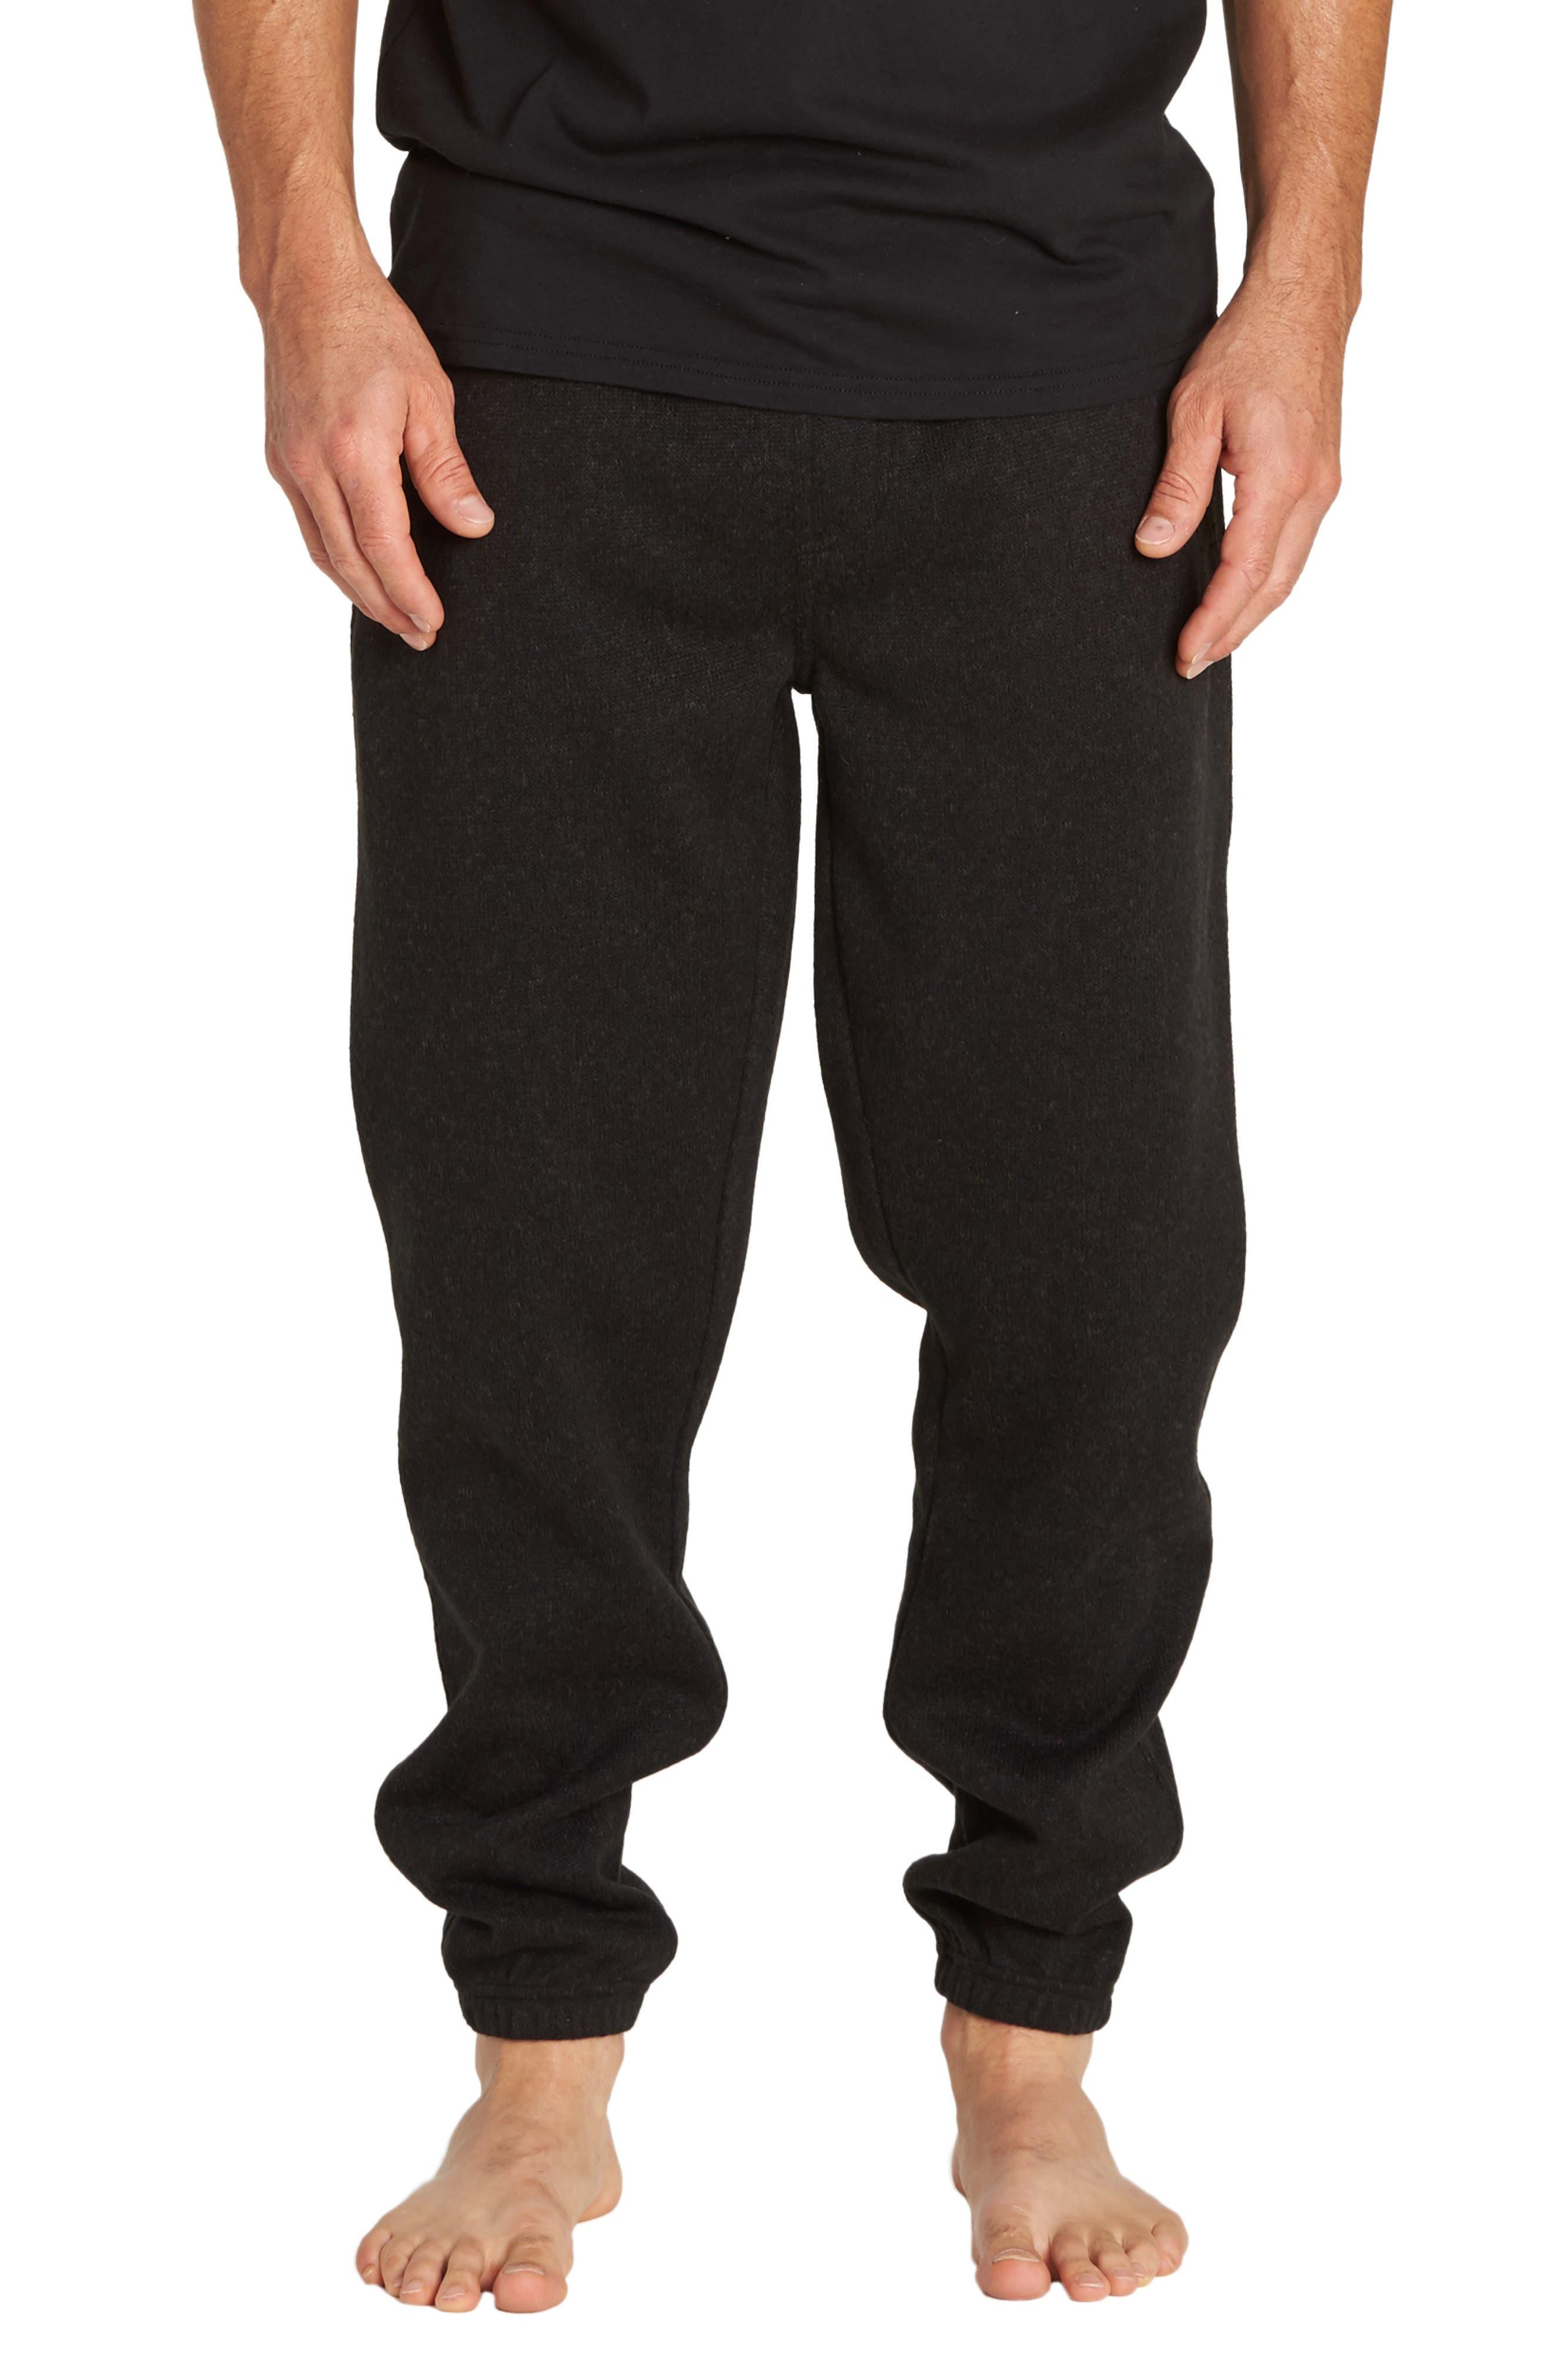 Boundary Sweatpants,                         Main,                         color, BLACK HEATHER